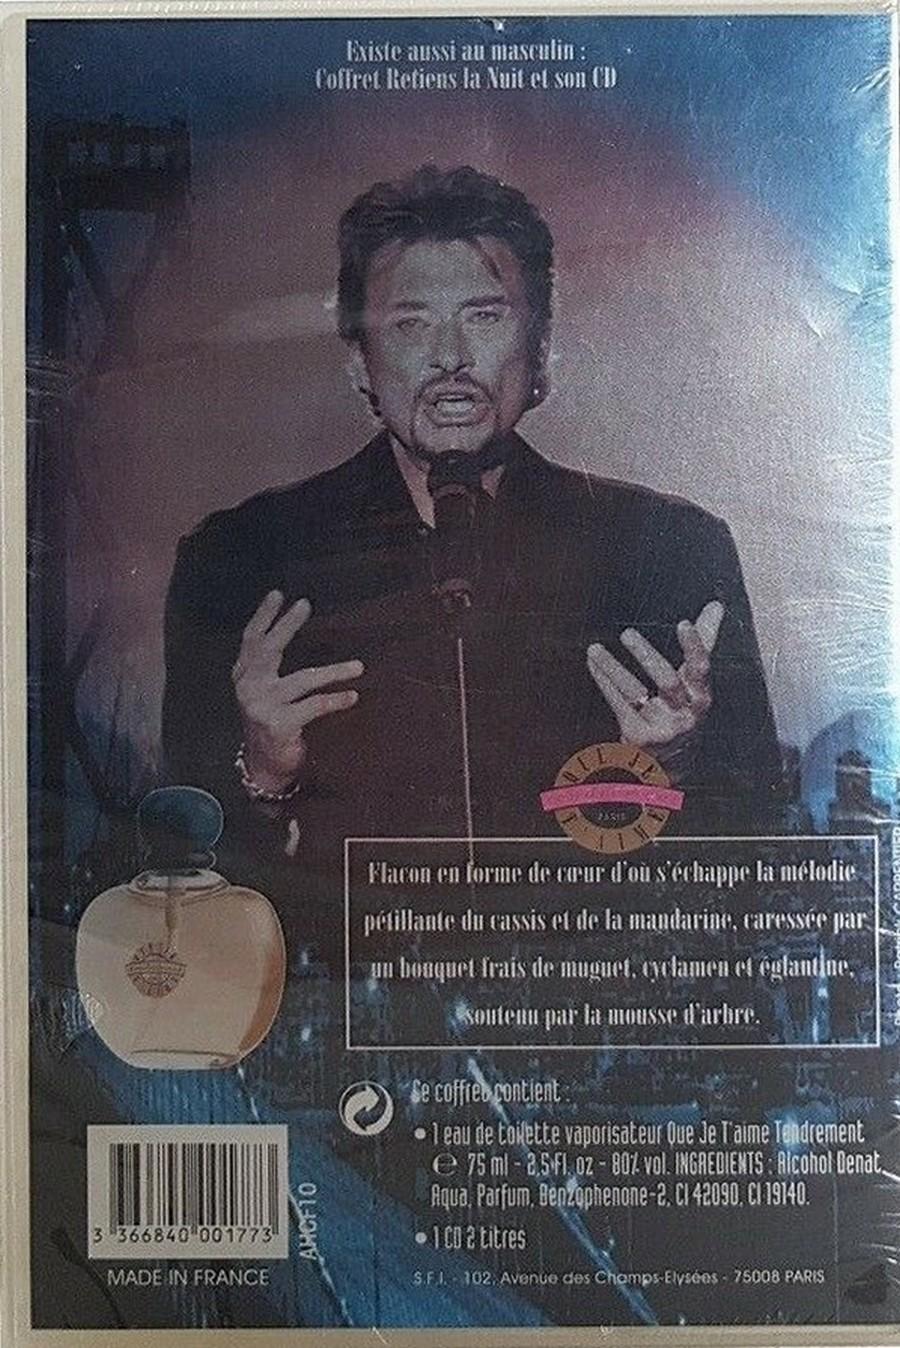 PARFUMS JOHNNY HALLYDAY ( COFFRET + CD )( 1995 - 1998 ) 1998_q13